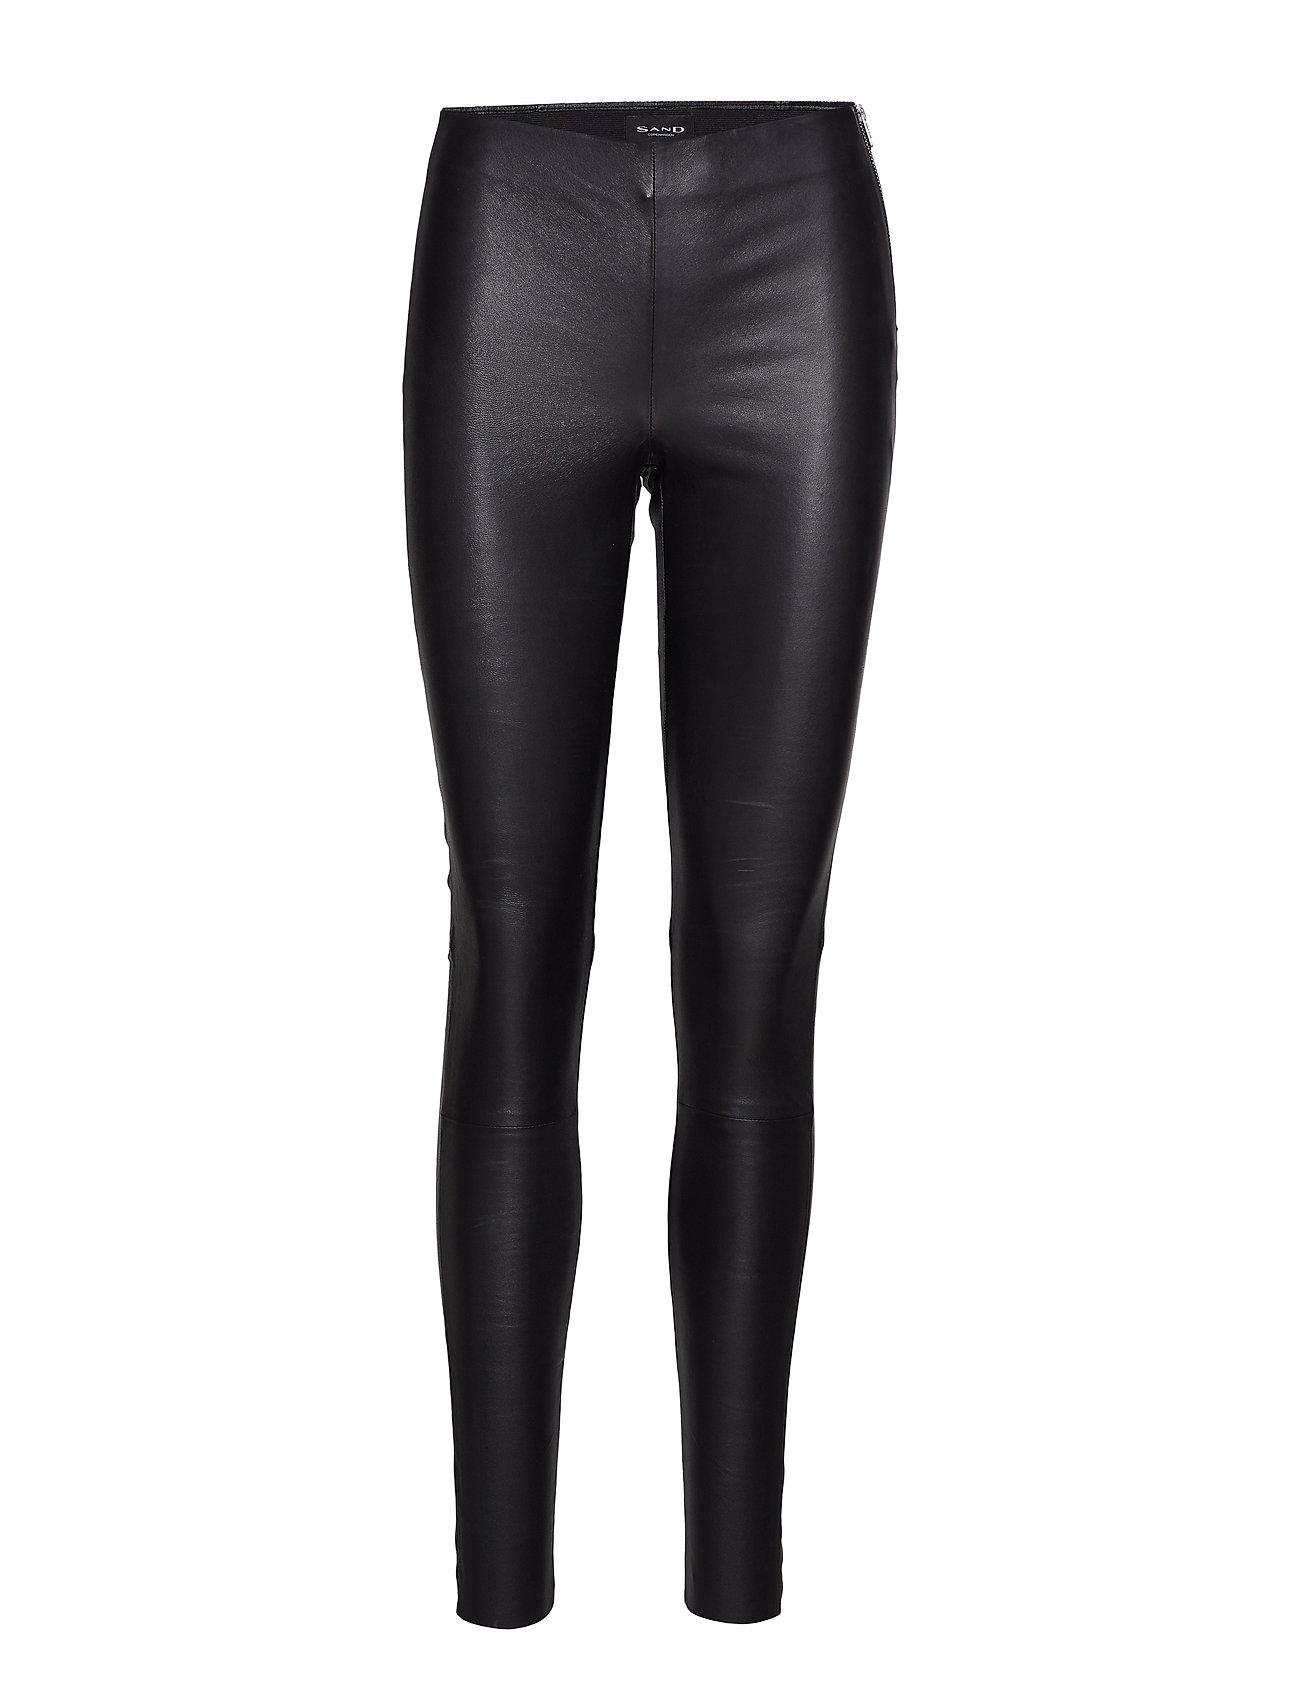 Image of Stretch Leather - Shamar Leather Leggings/Bukser Sort SAND (3118686211)